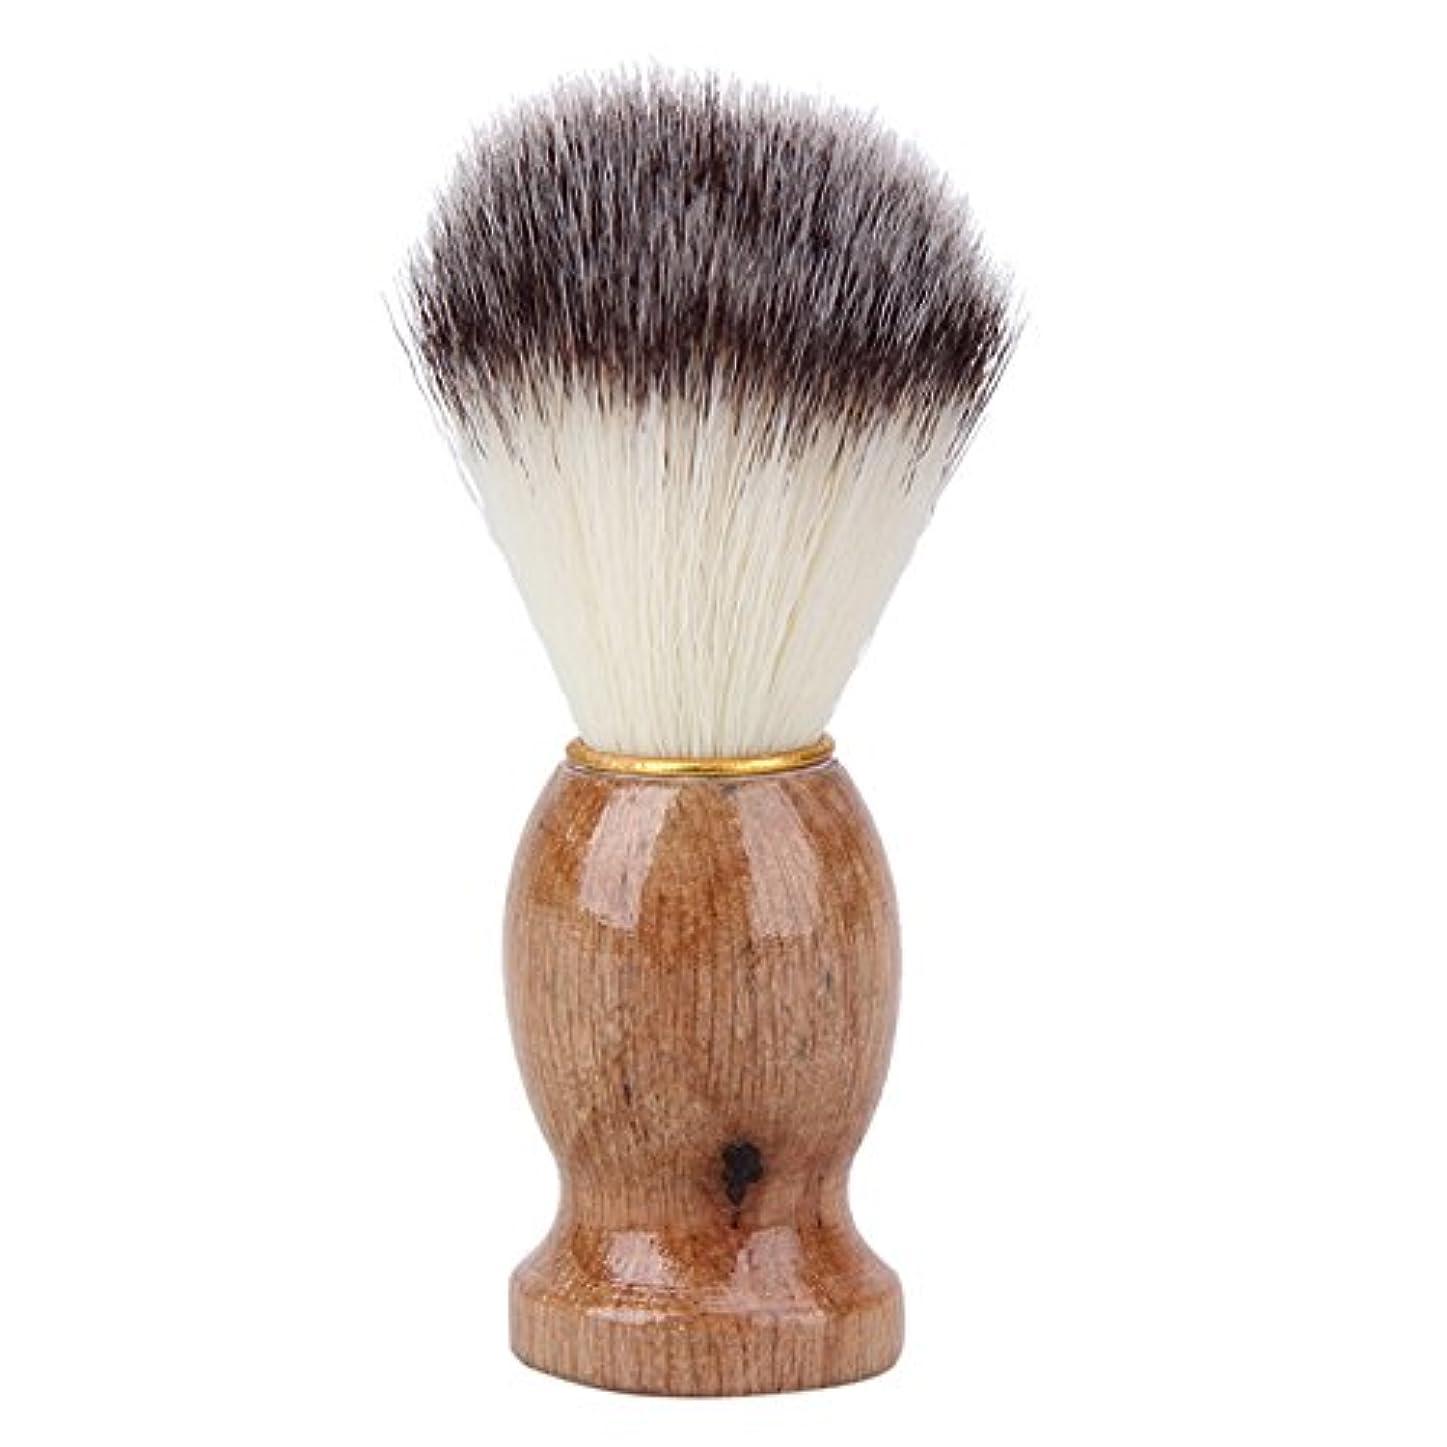 wangten メンズ用 髭剃り ブラシ シェービング ブラシ アナグマ毛 木製ハンドル 泡立ち 理容 洗顔 髭剃り